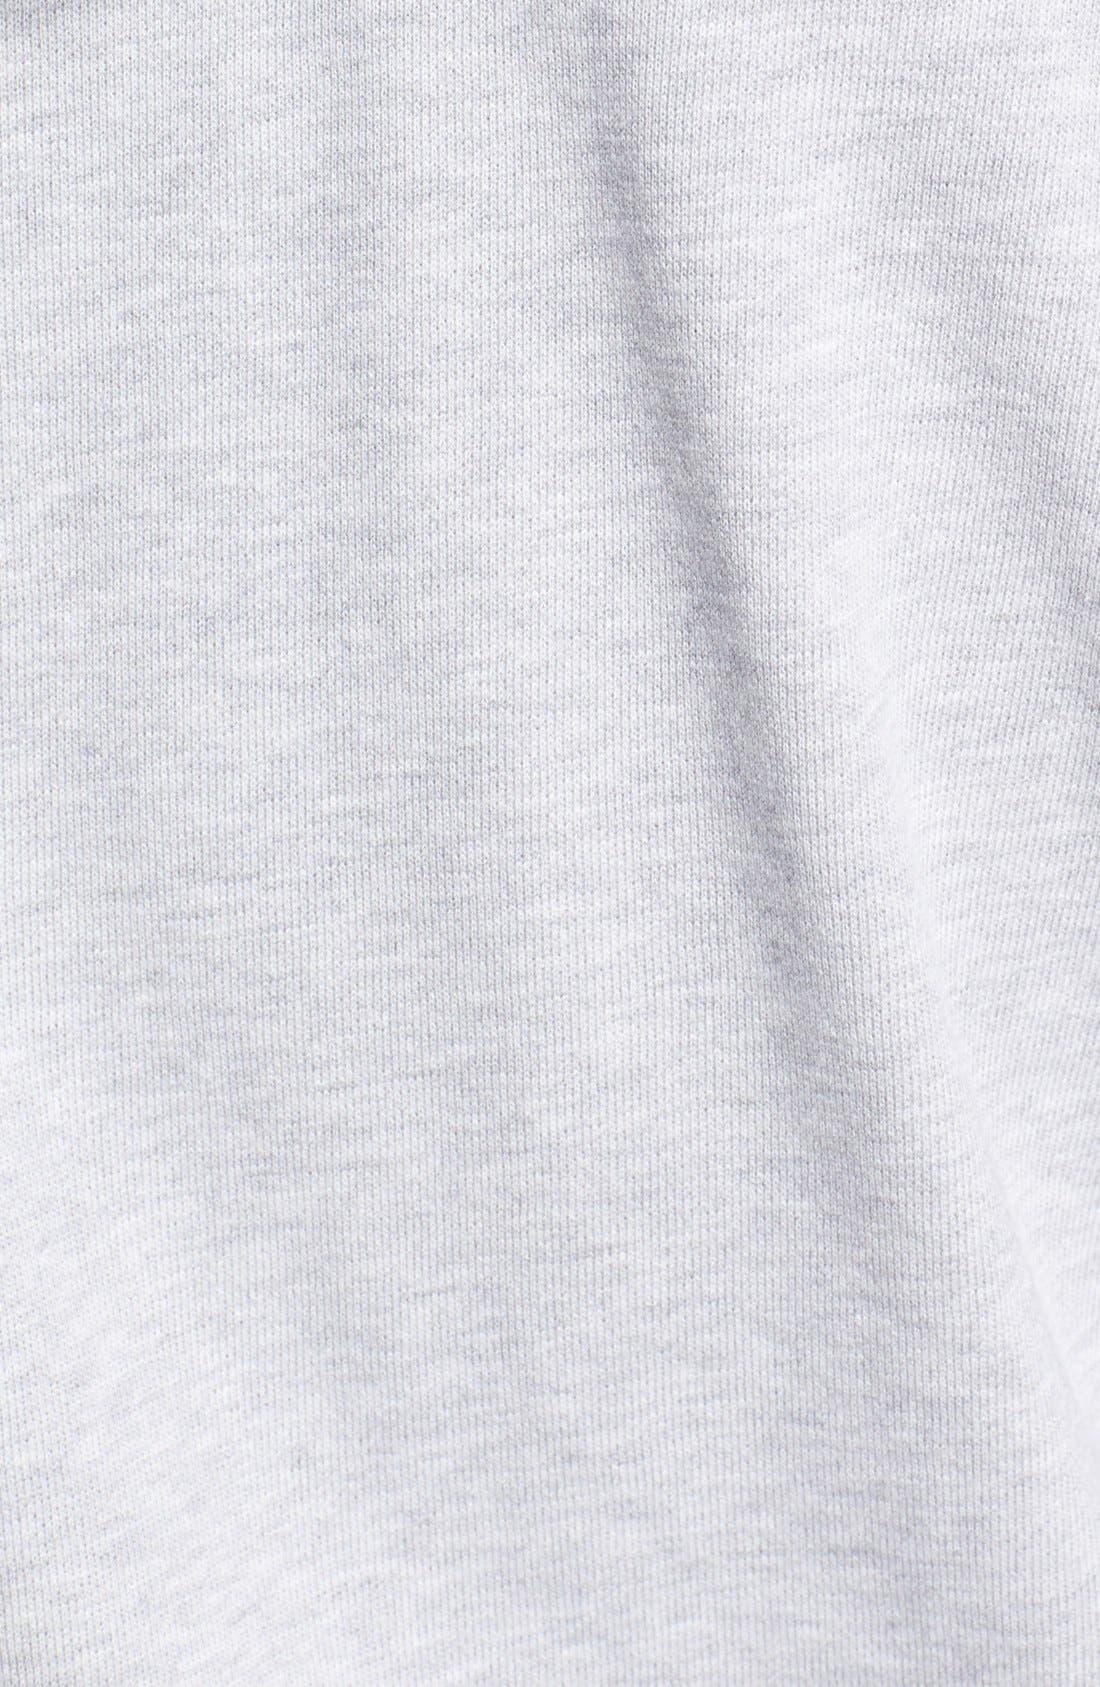 Alternate Image 3  - BOSS HUGO BOSS 'Innovation 6' Zip Hoodie